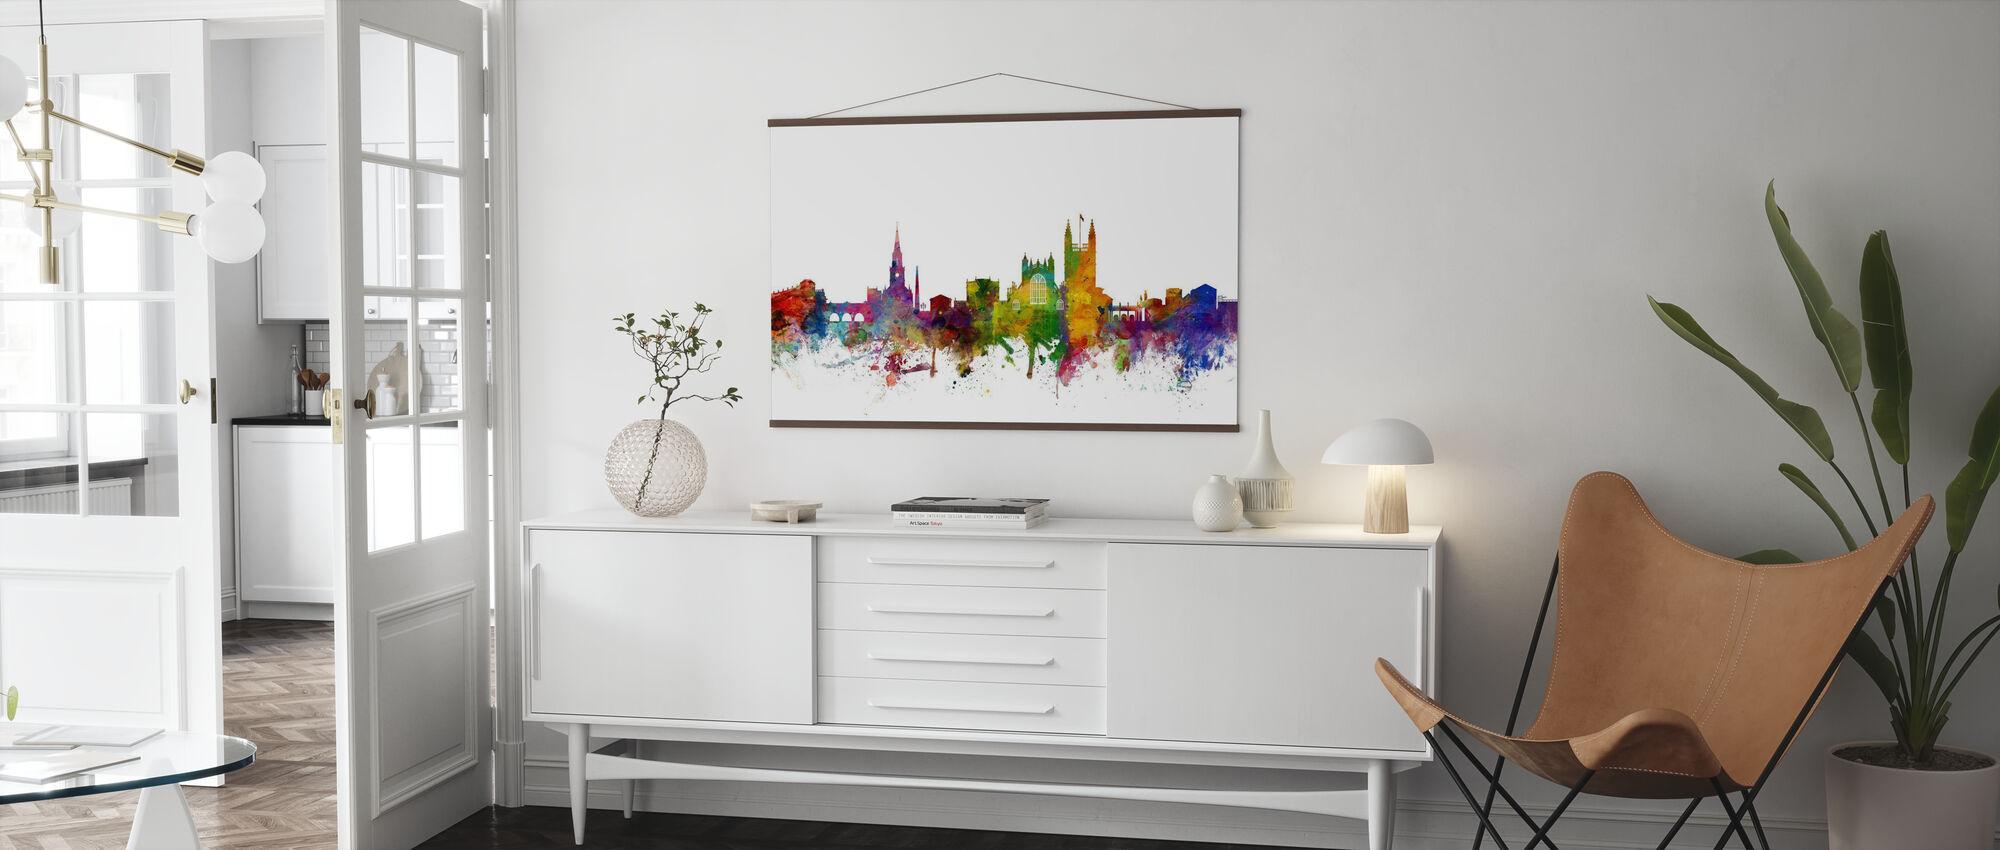 Bath England Skyline - Poster - Living Room